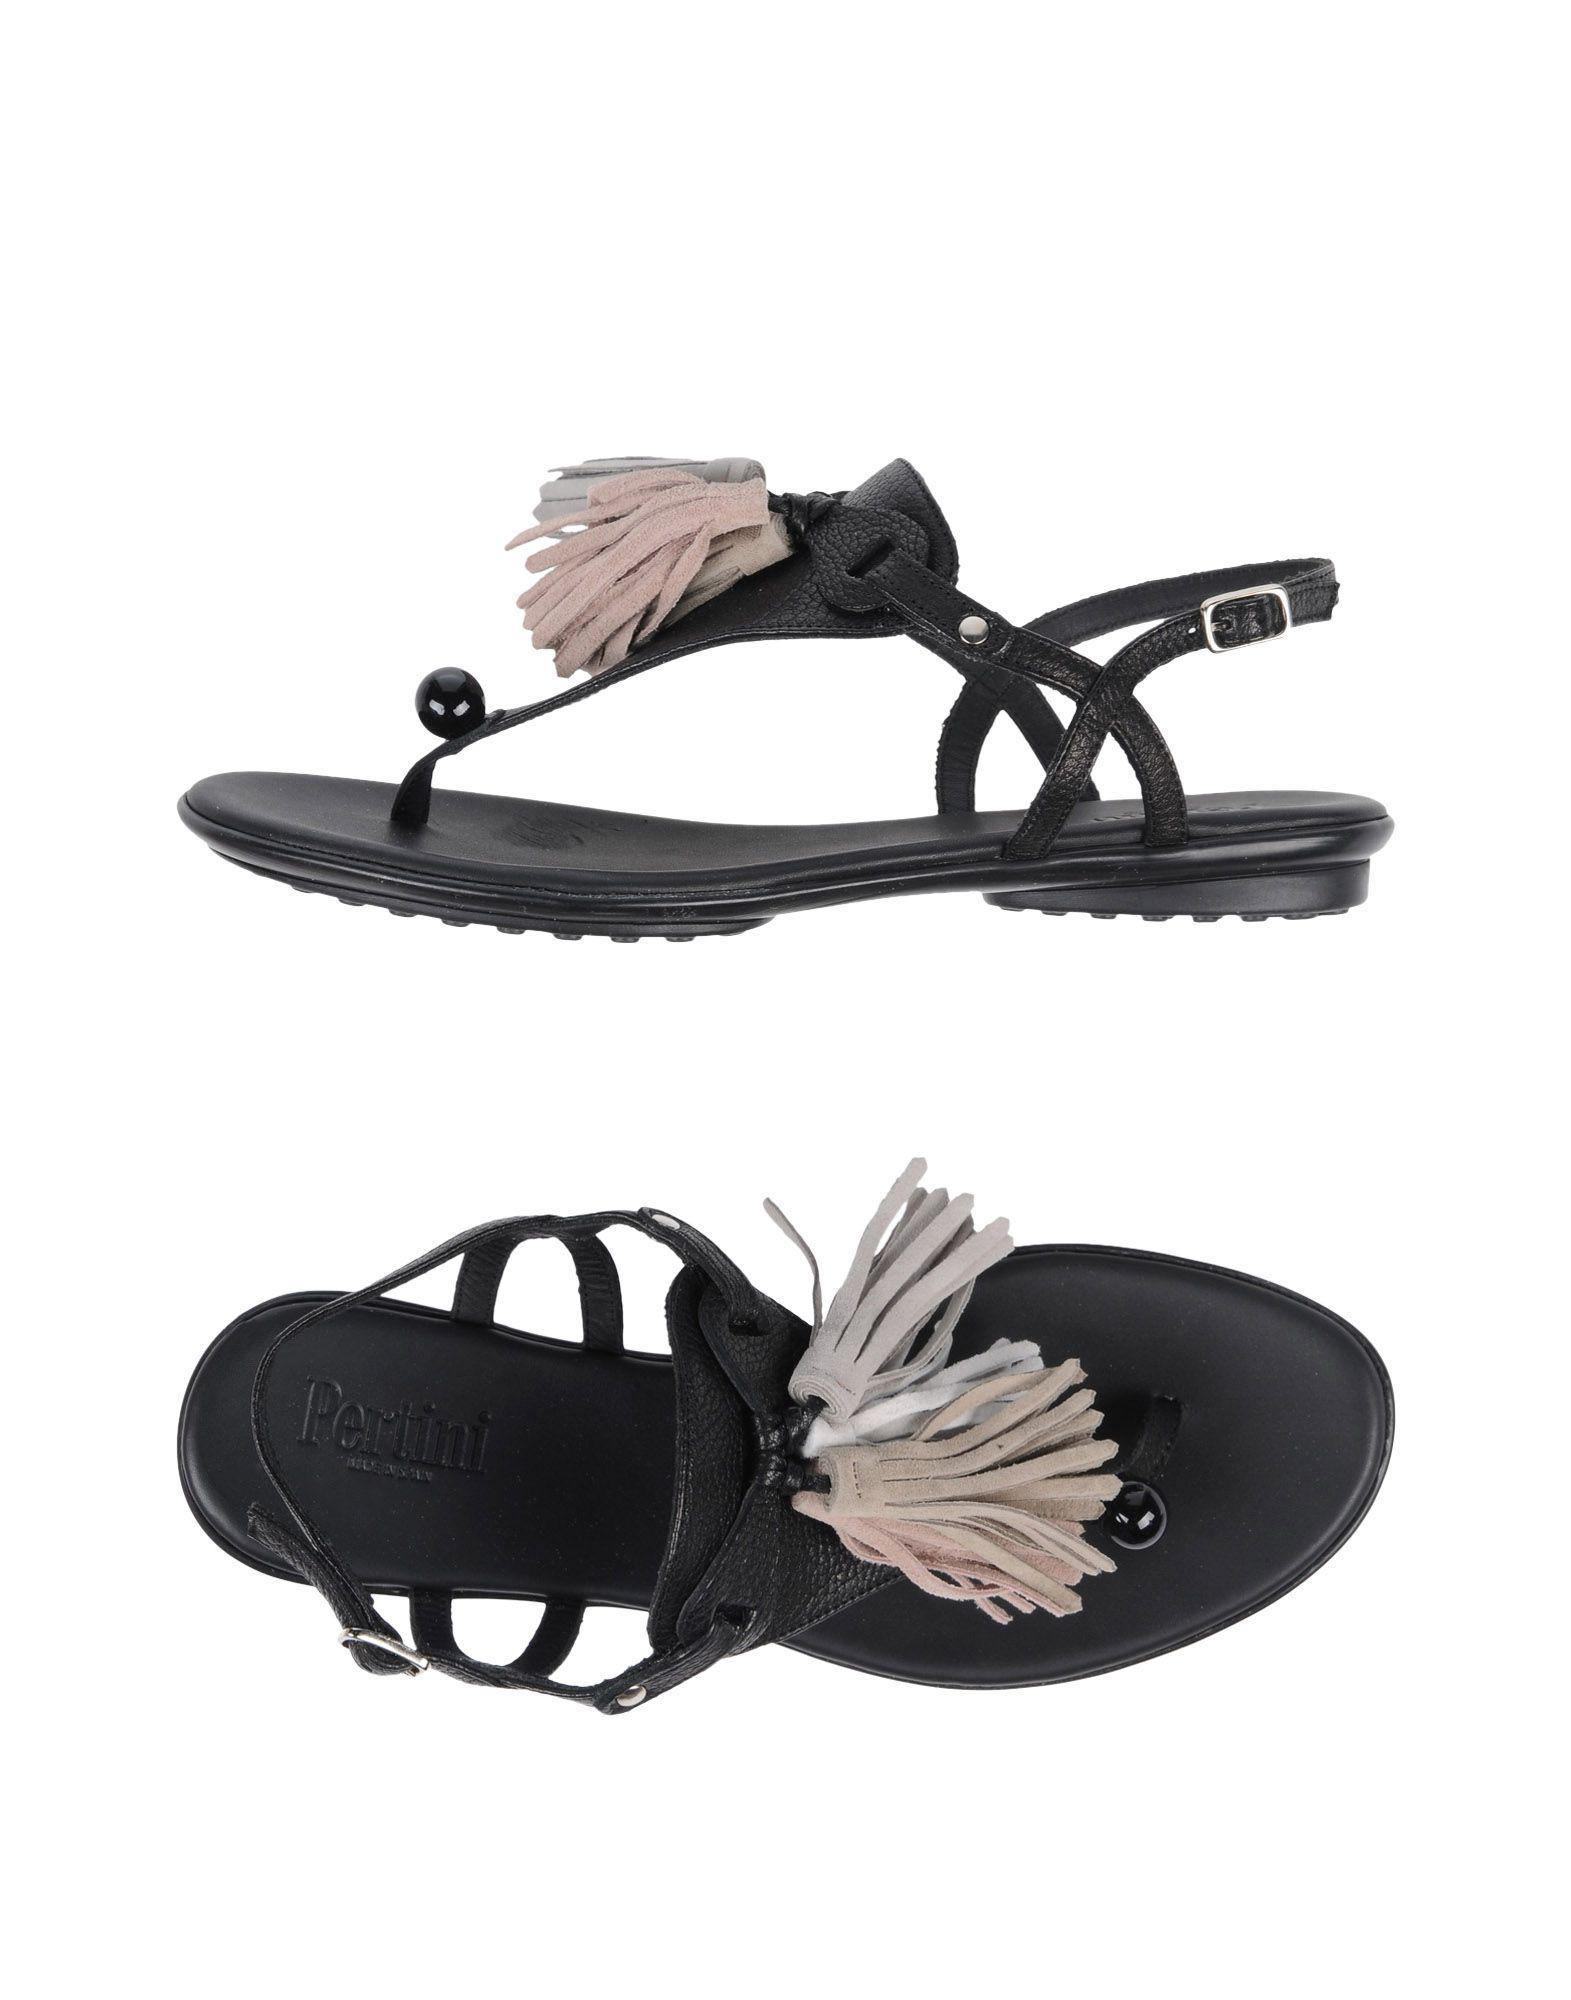 Chaussures - Sandales Entredoigt Pertini XyQ0jYqj